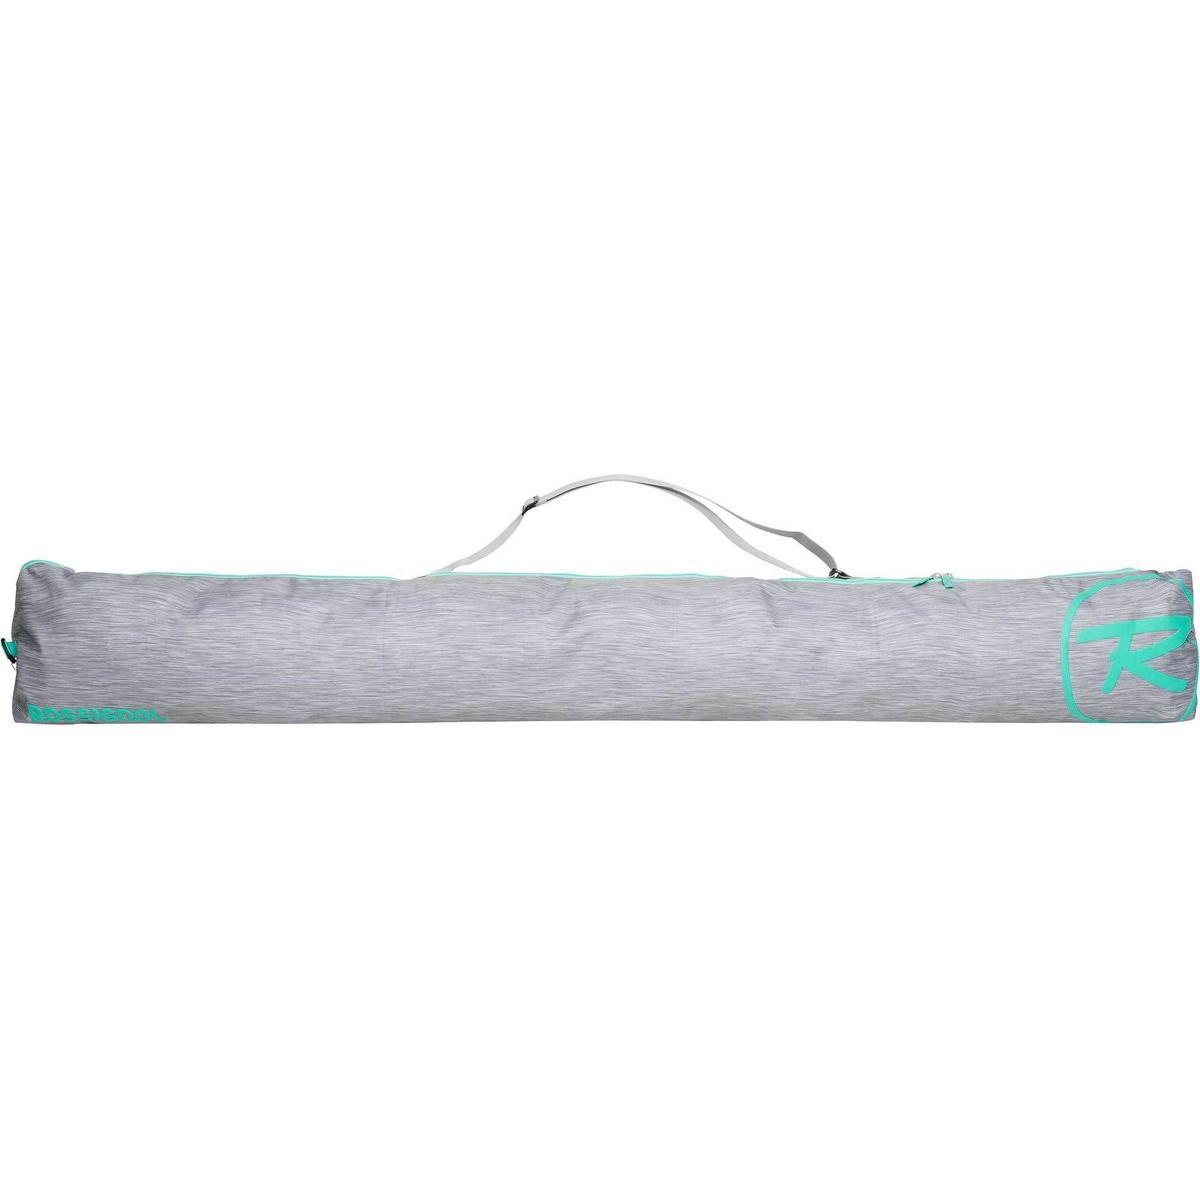 Rossignol Electra Extendable Ski Bag 140-180